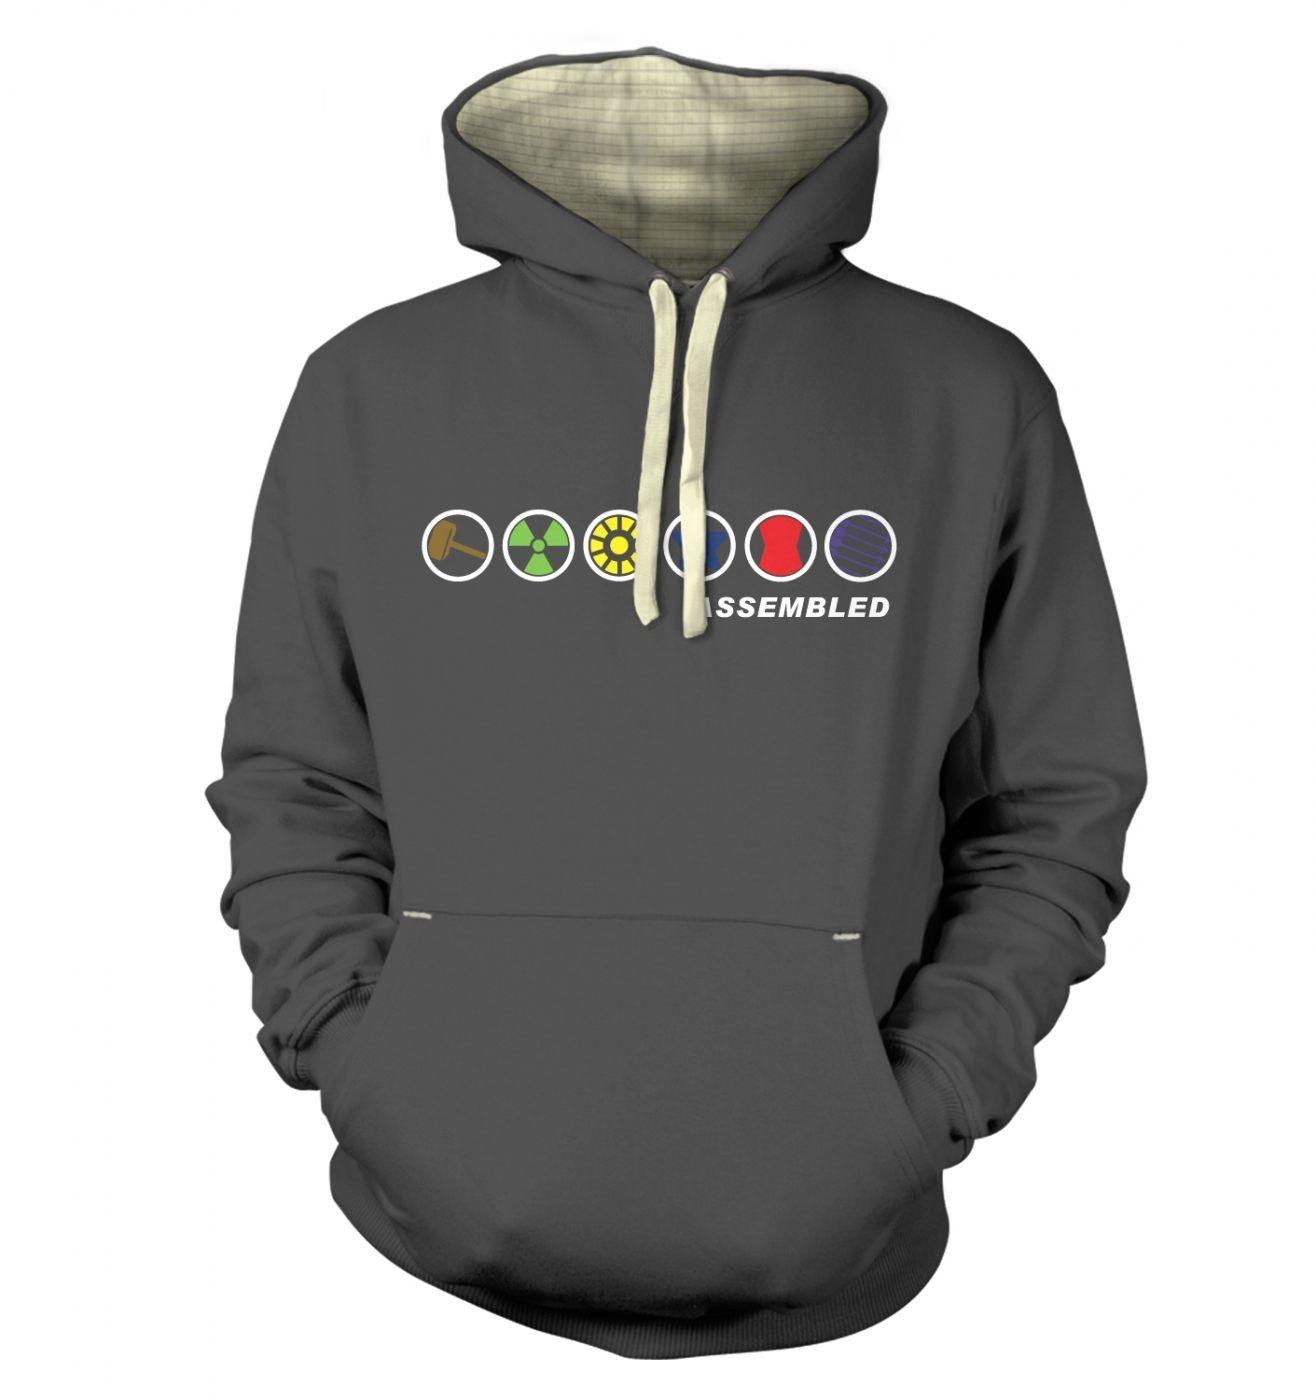 Assembled In A Row hoodie (premium)